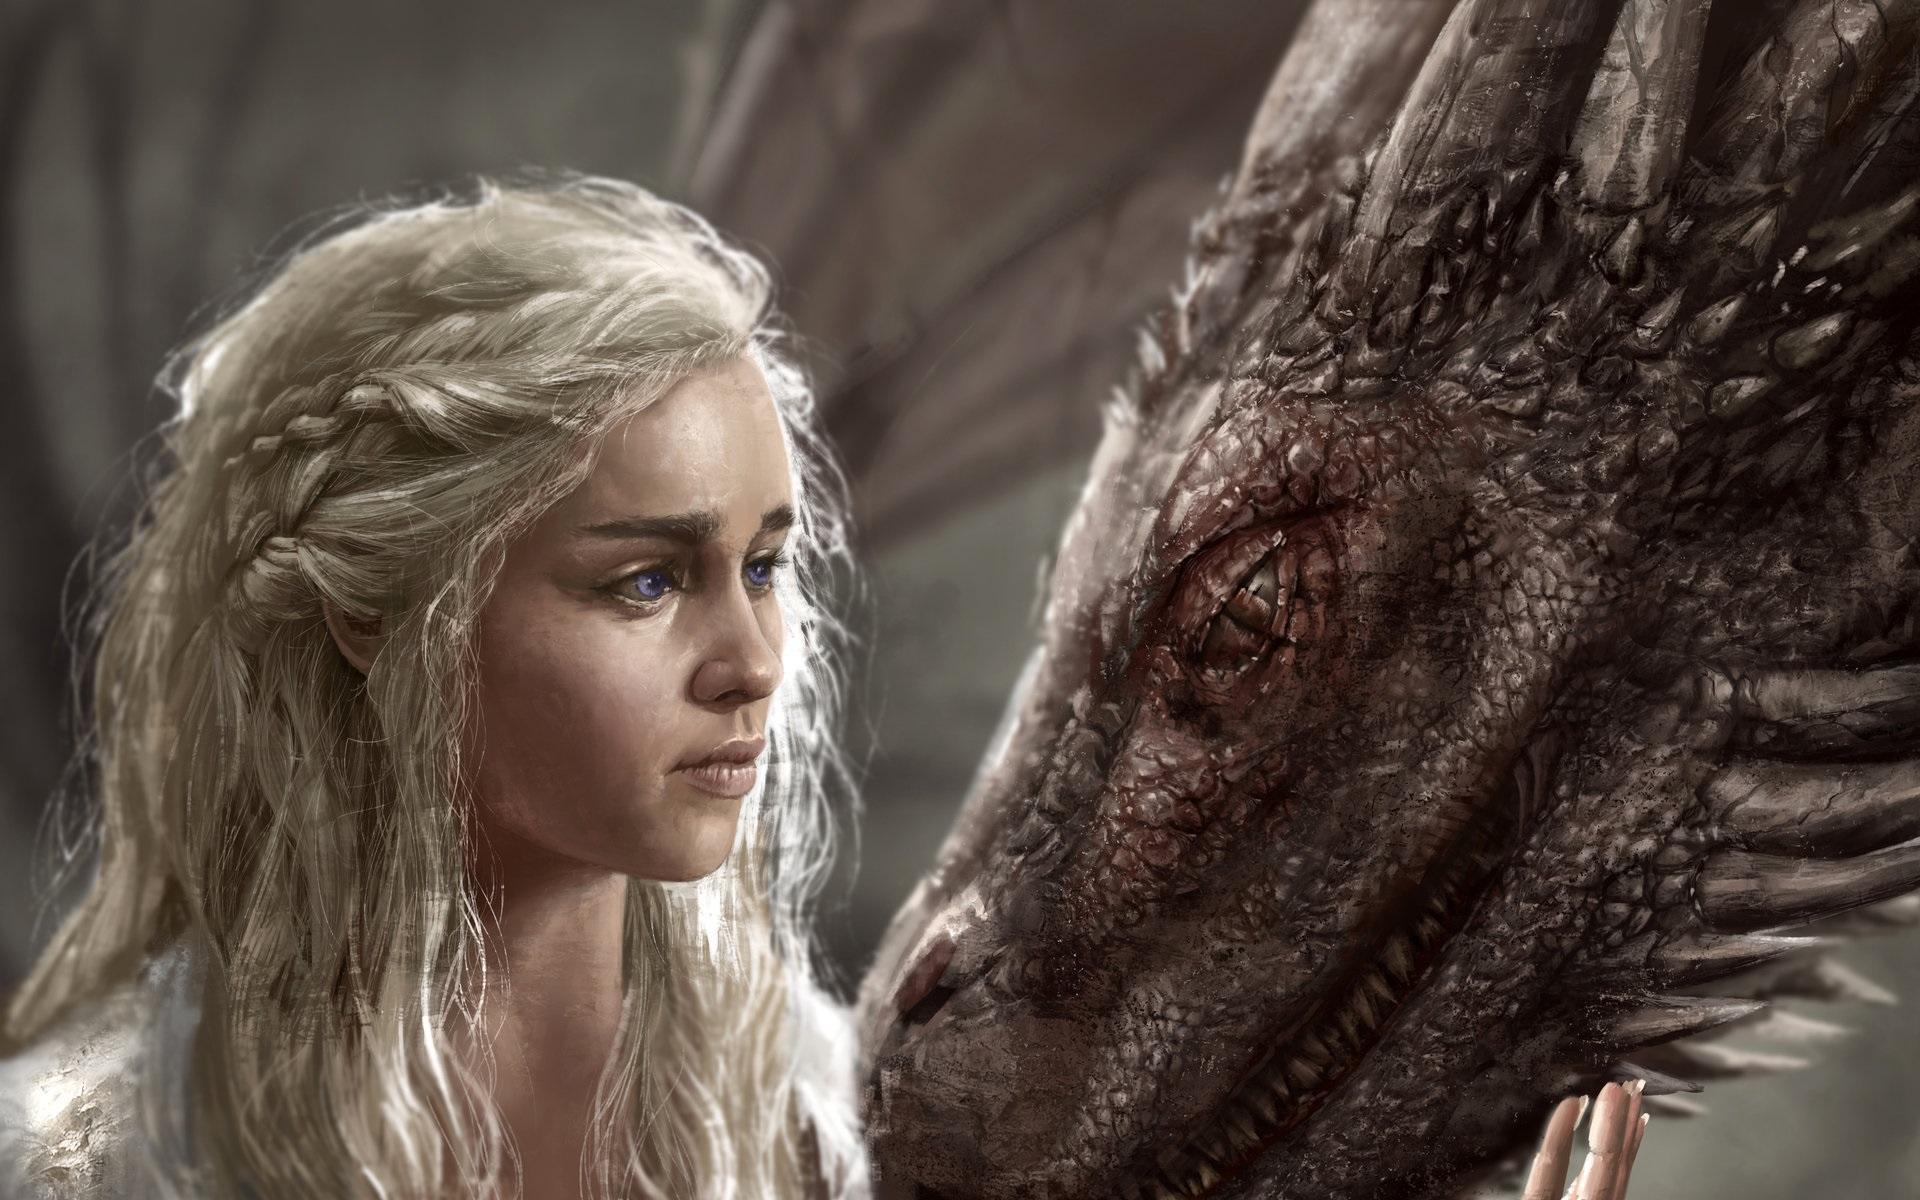 Daenerys Targaryen Hd Wallpaper - Best Pictures Of Daenerys Targaryen , HD Wallpaper & Backgrounds